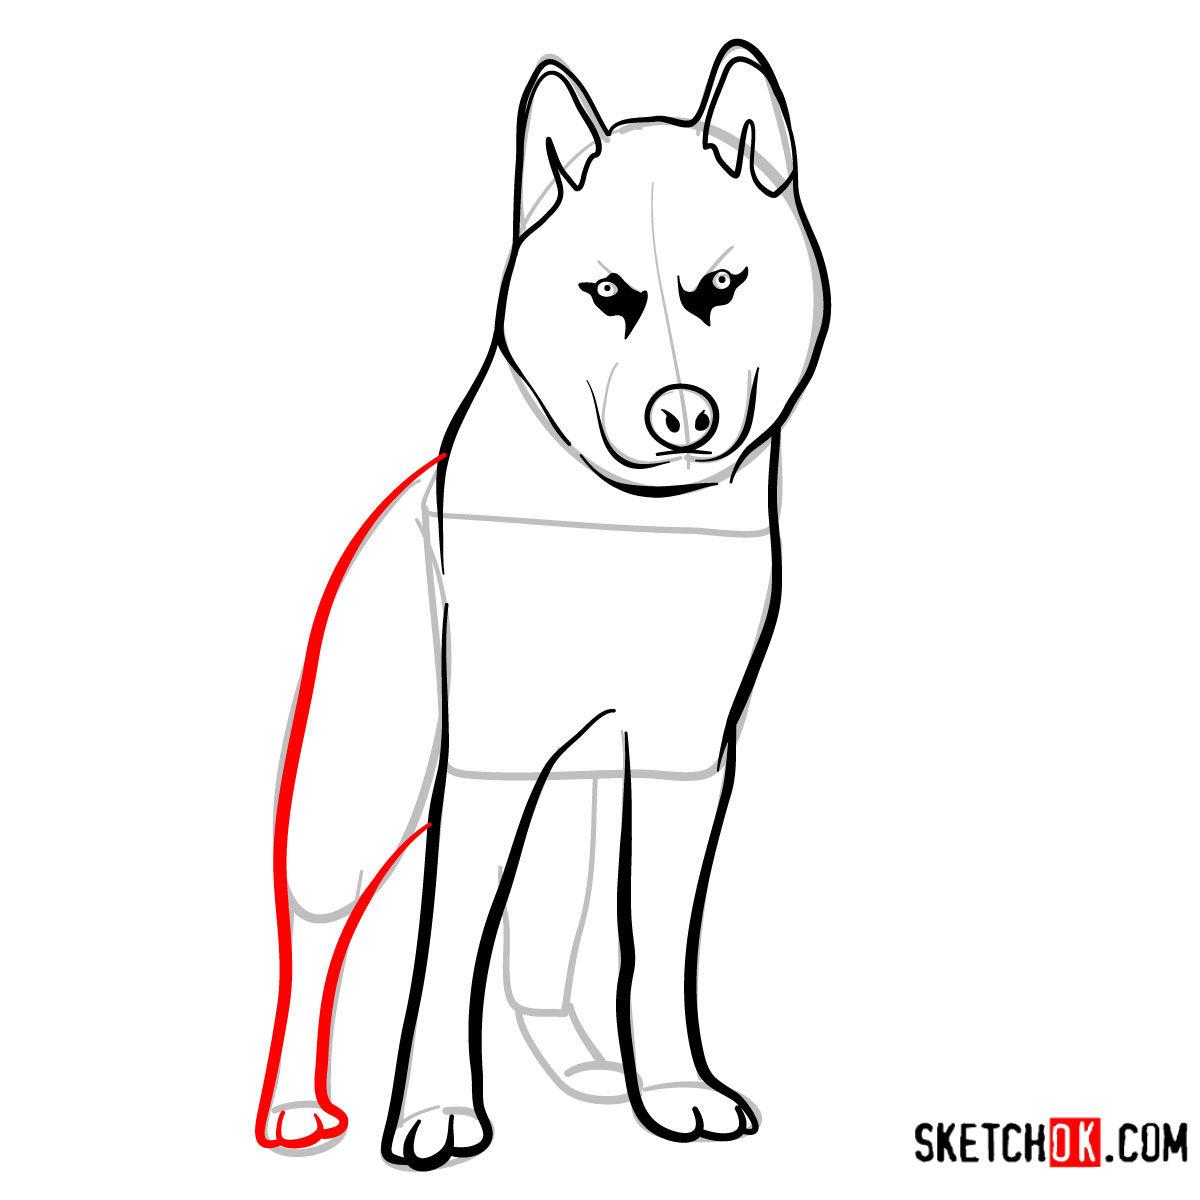 How to draw the Husky dog - step 07